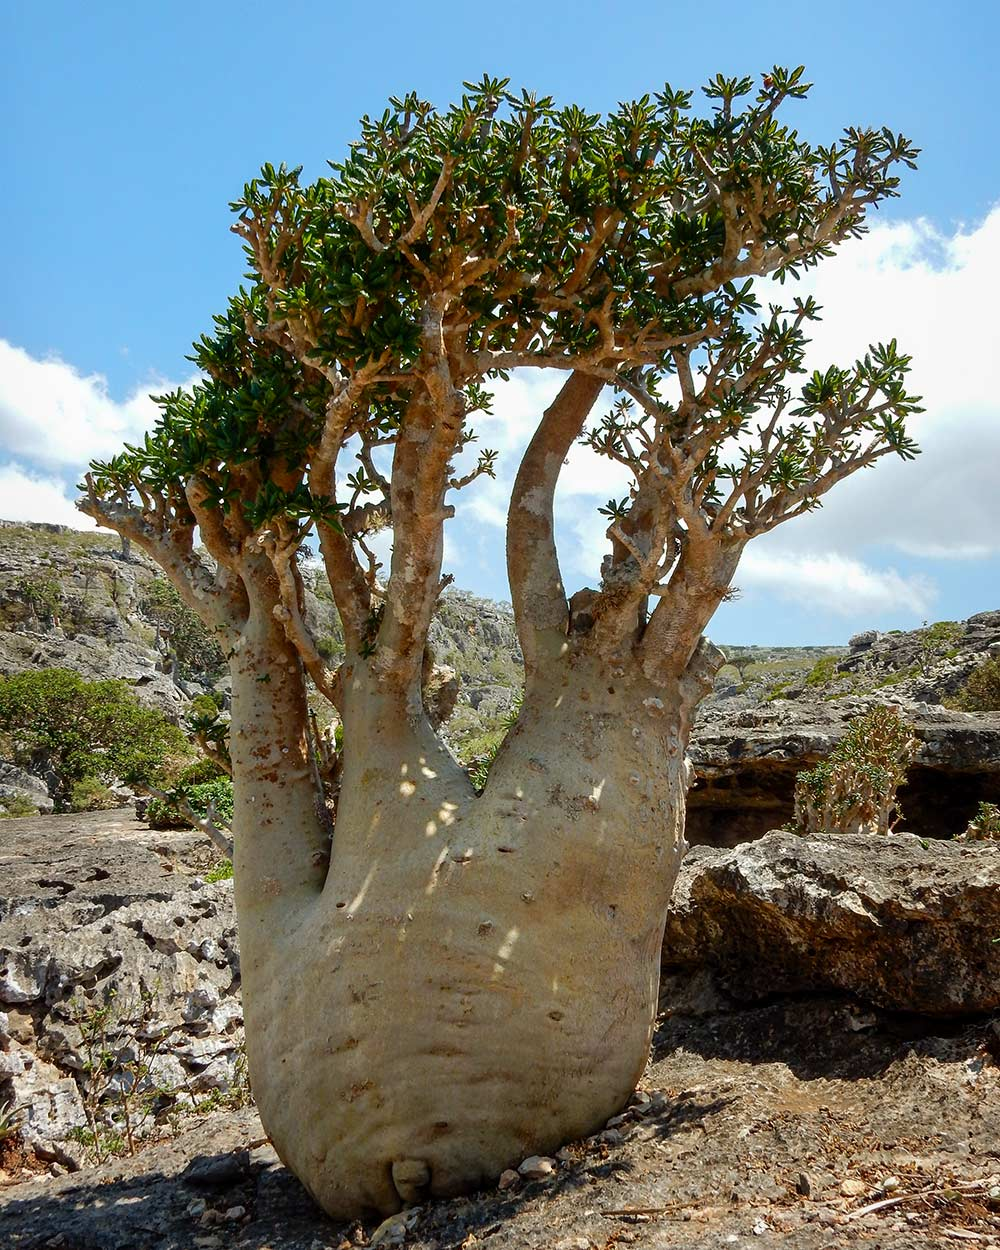 Mature plant of Dorstenia gigas on Socotra Island, Yemen